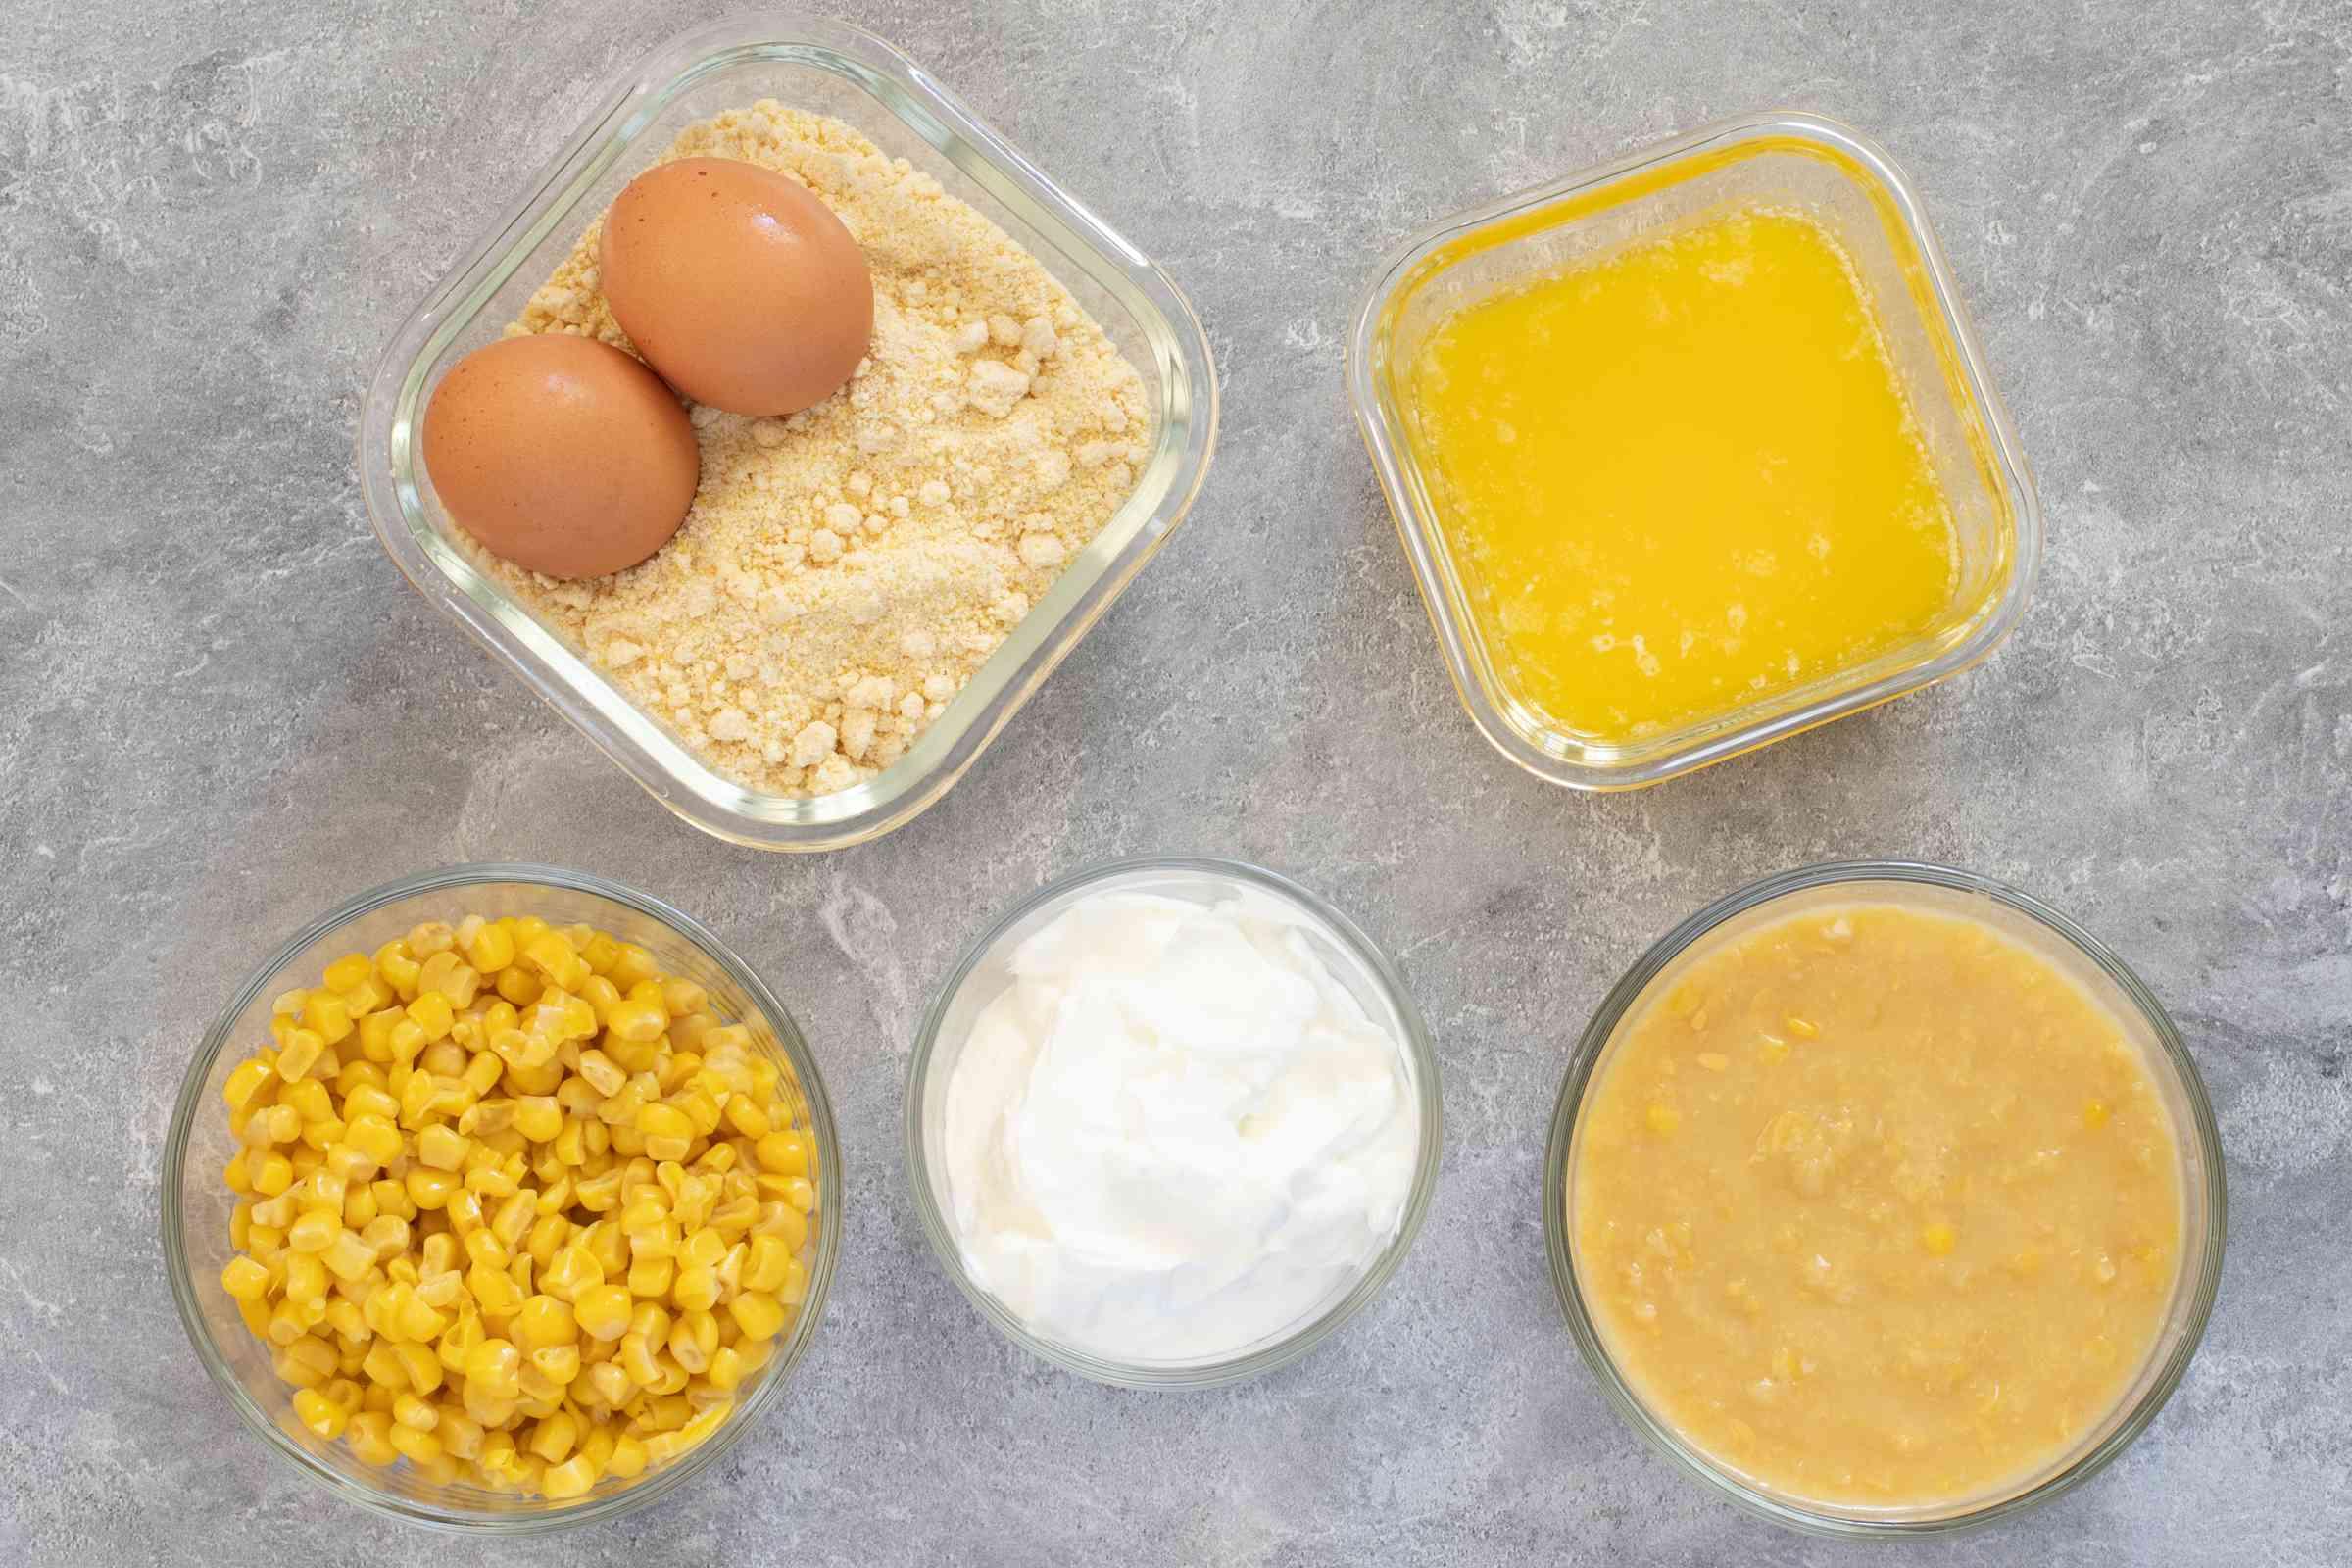 ingredients for cornbread casserole